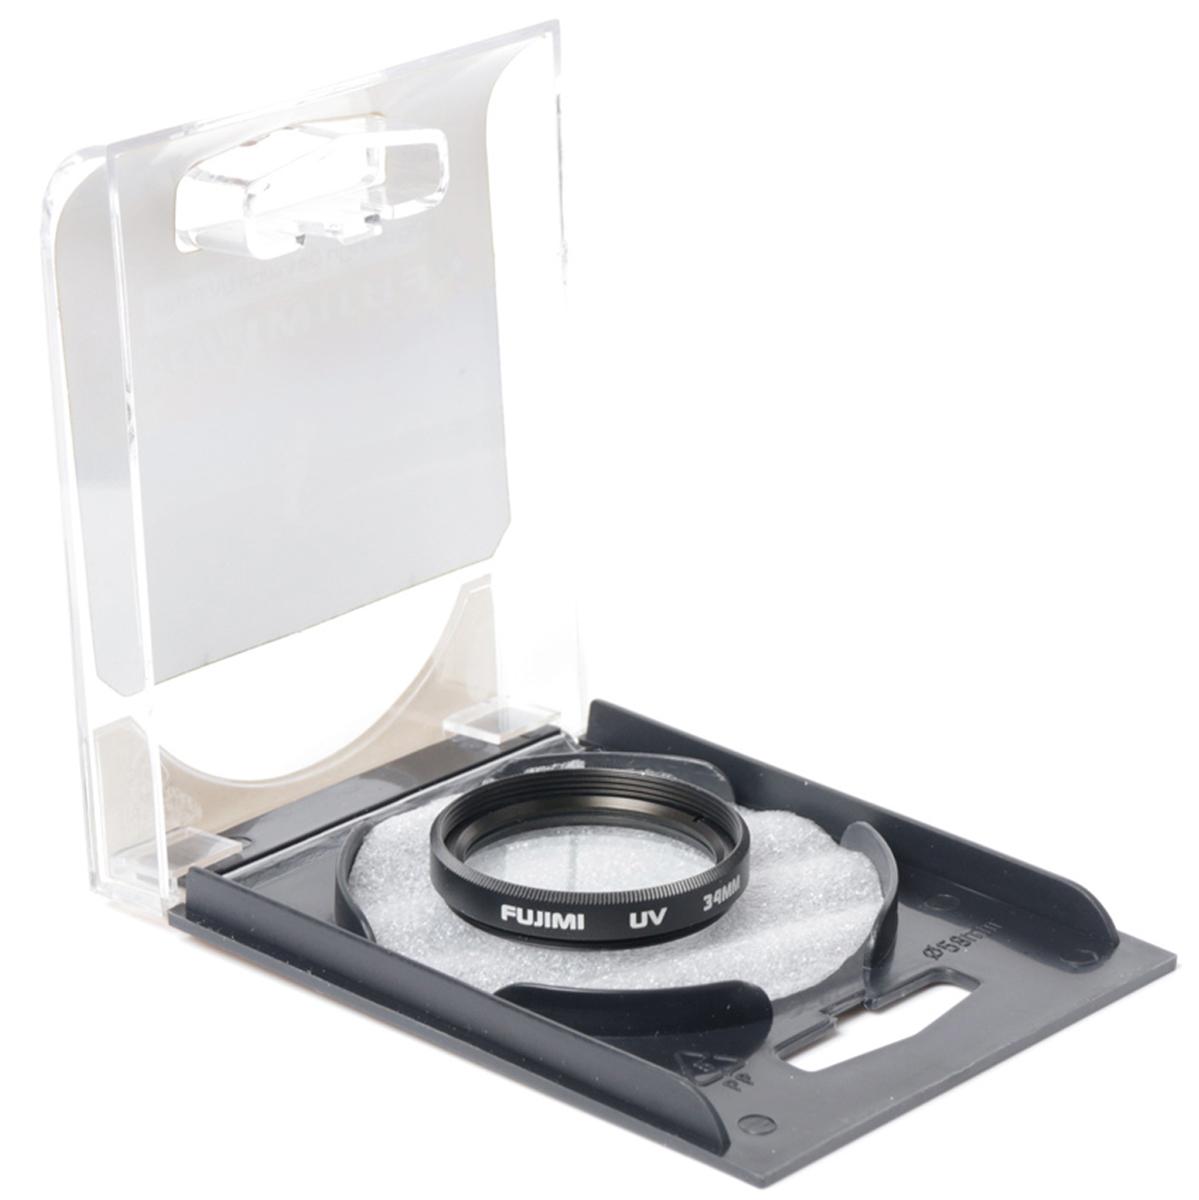 Zakazat.ru Fujimi UV М34мм, Black ультрафиолетовый фильтр (34 мм)